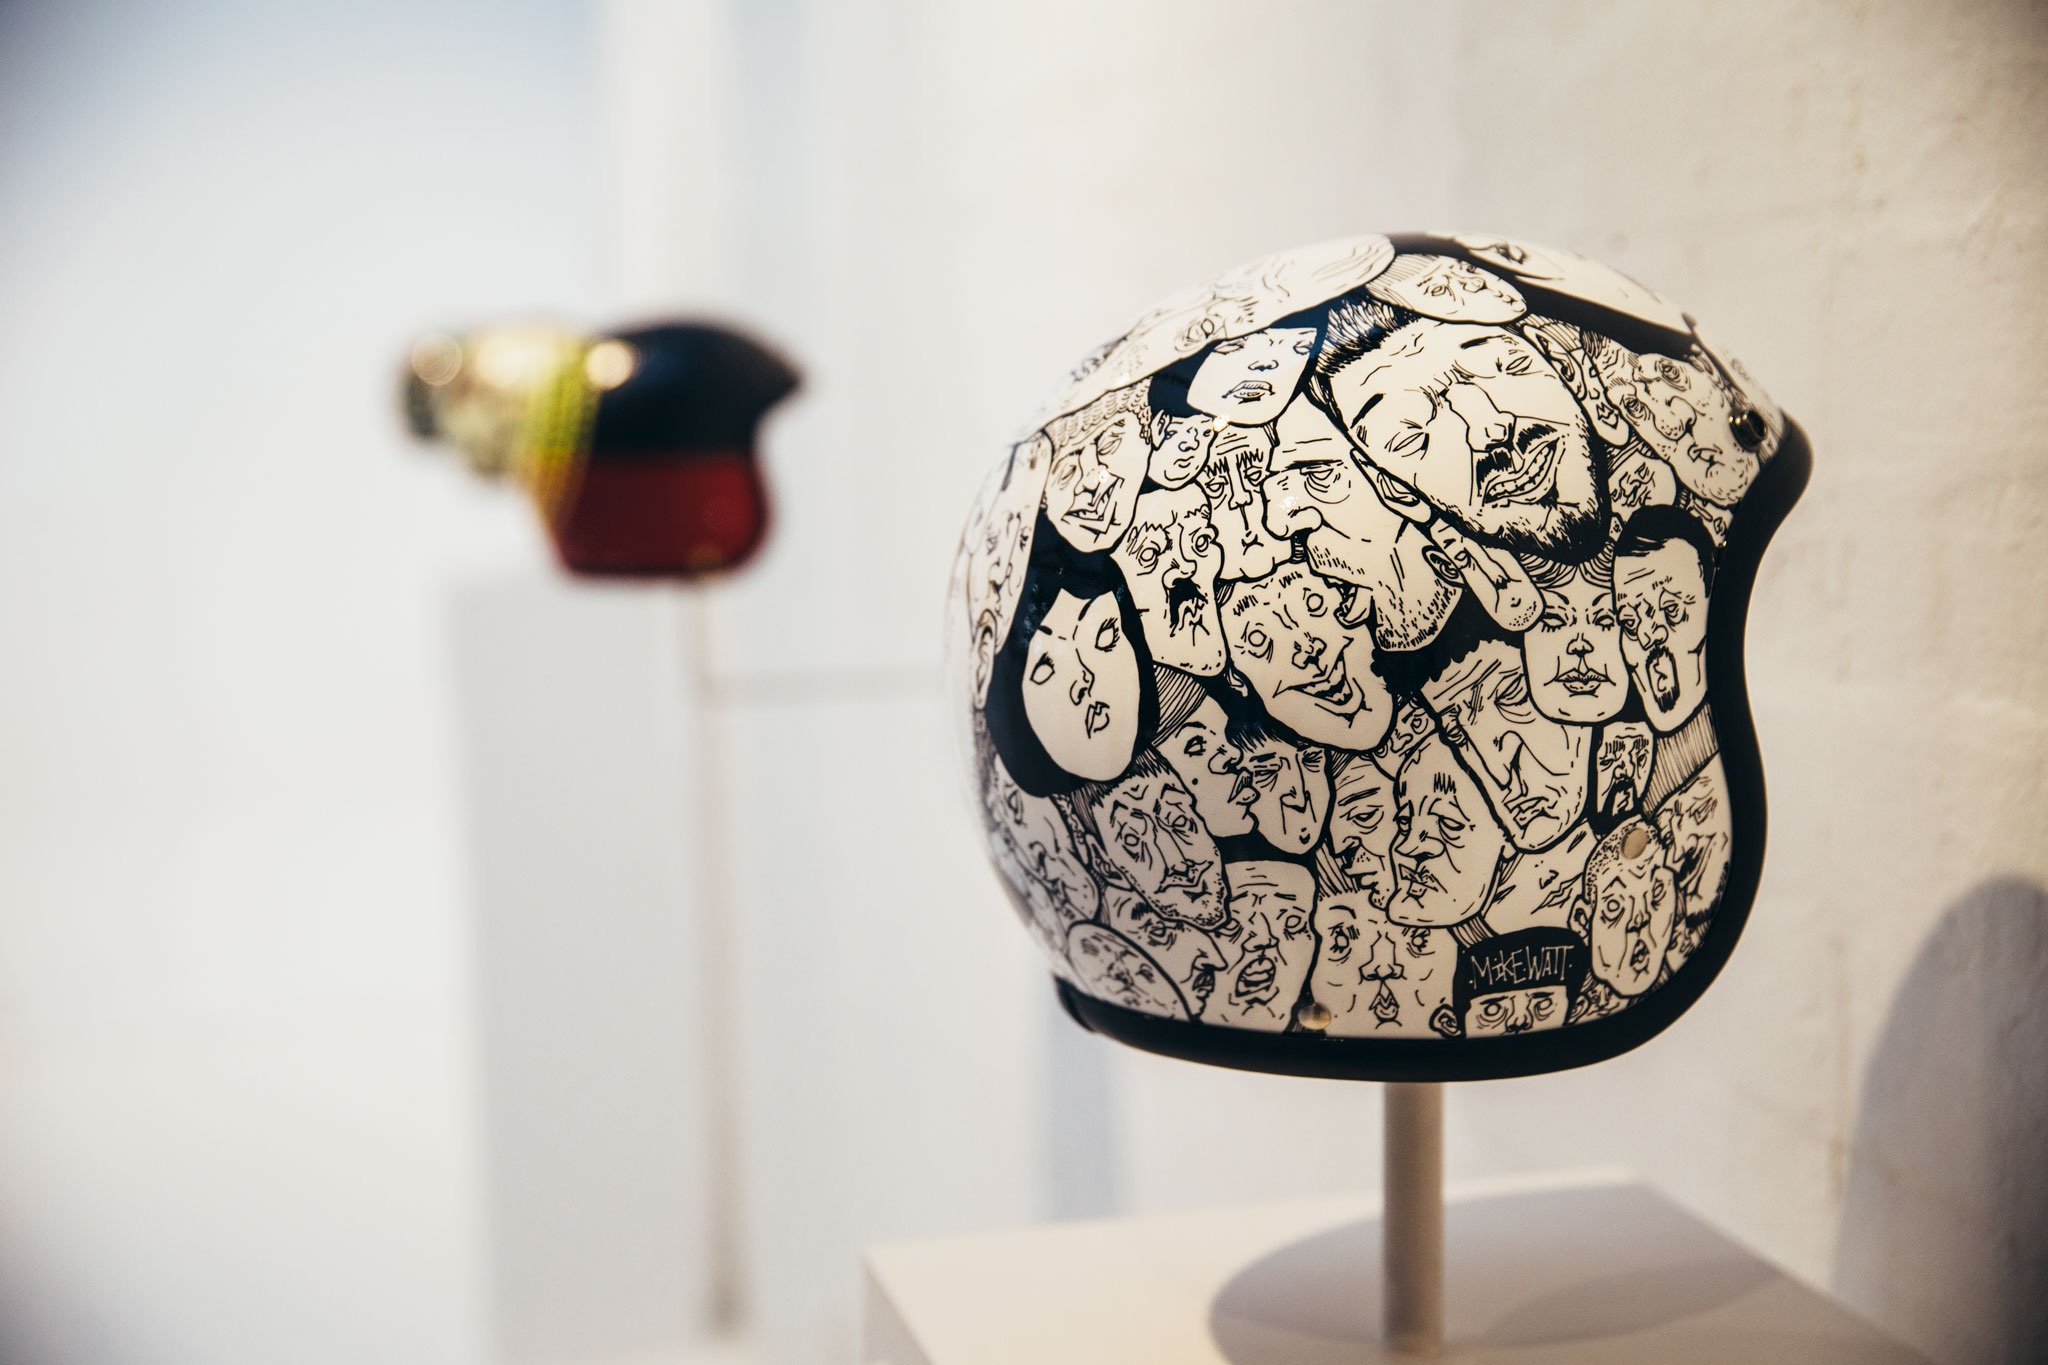 Art Pharamacy_Vandal Gallery_Sabotage MotorcyclesTwenty20_exhibition_5422.jpg